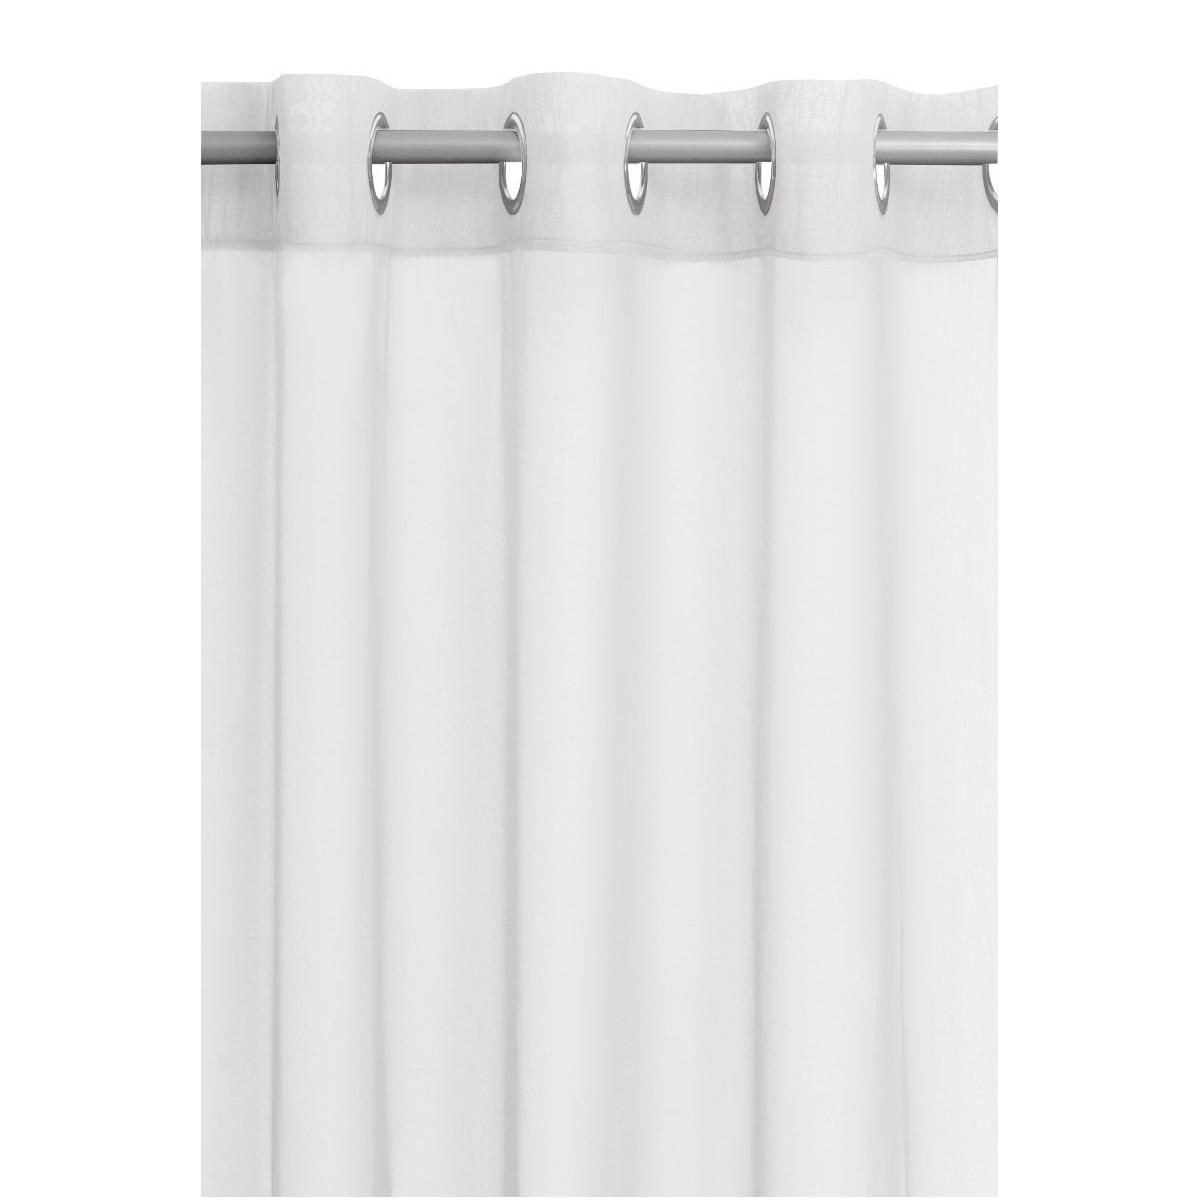 vorhang gardine transparent senschal dekoschal mit sen in weiss. Black Bedroom Furniture Sets. Home Design Ideas